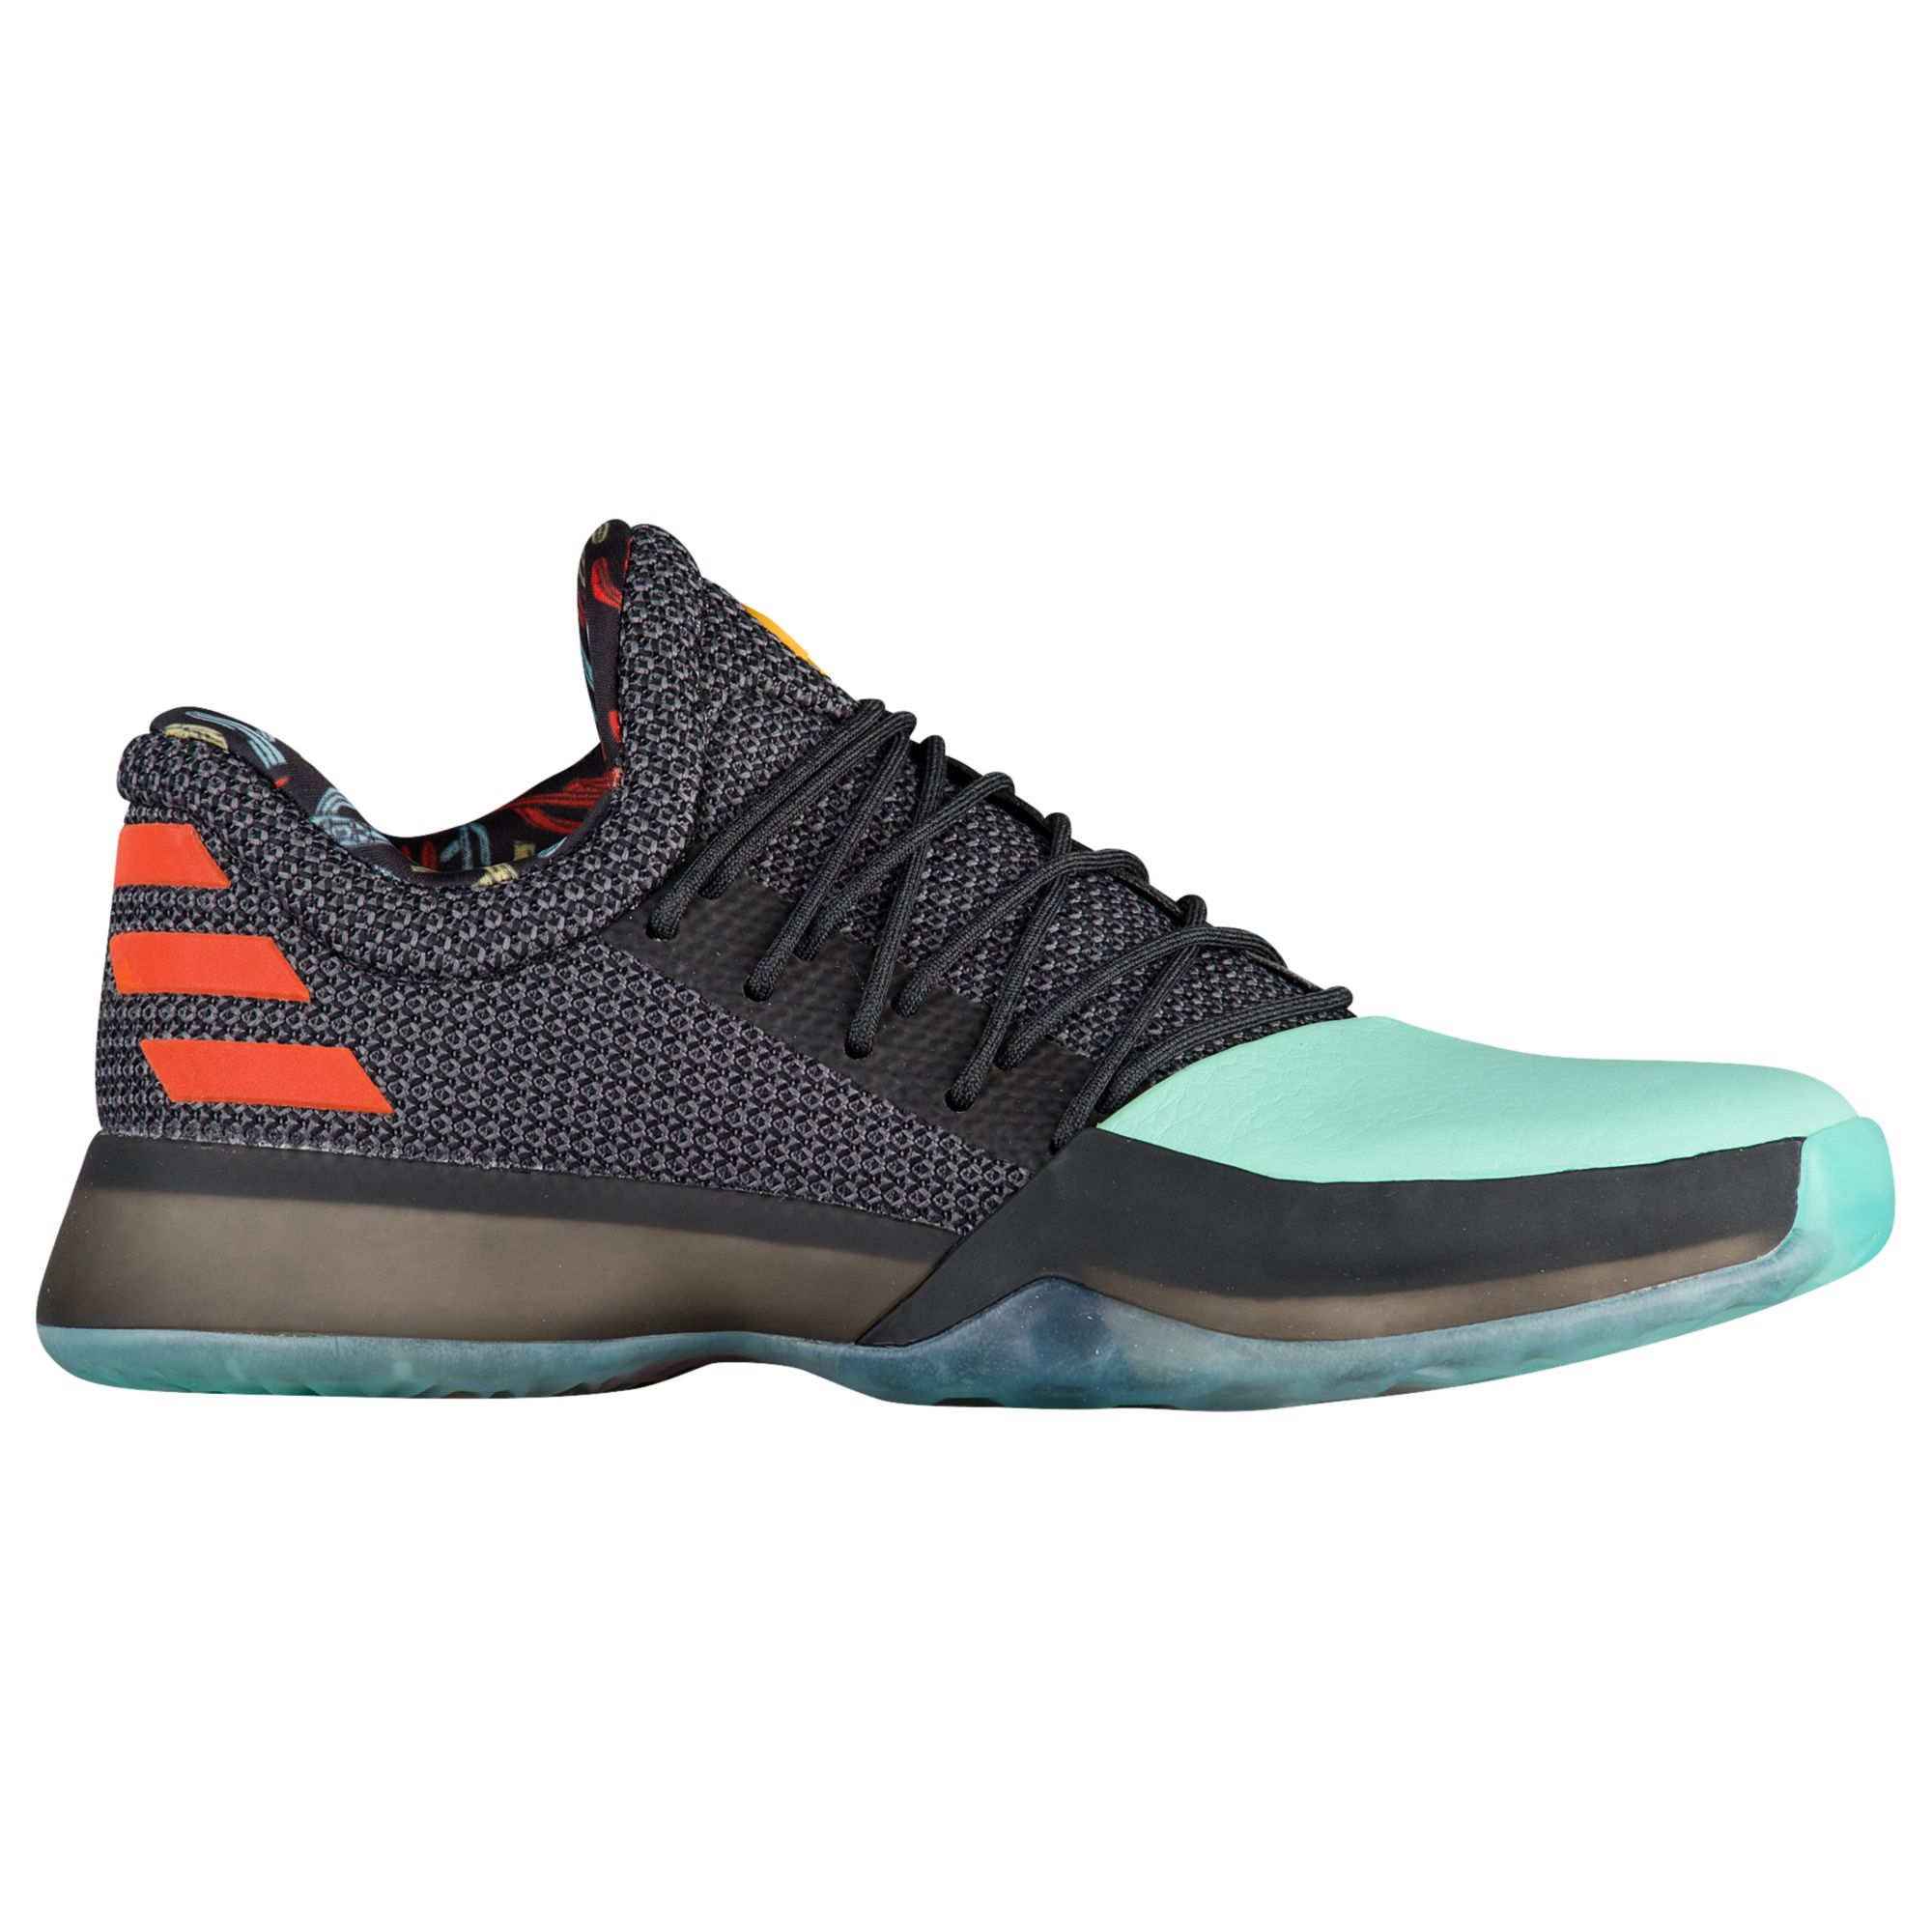 f704bdf92fff 1 pioneer basketball shoes 47d65 ecd94  discount code for adidas harden vol  1 cactus 1resize720720 9feb2 9134d